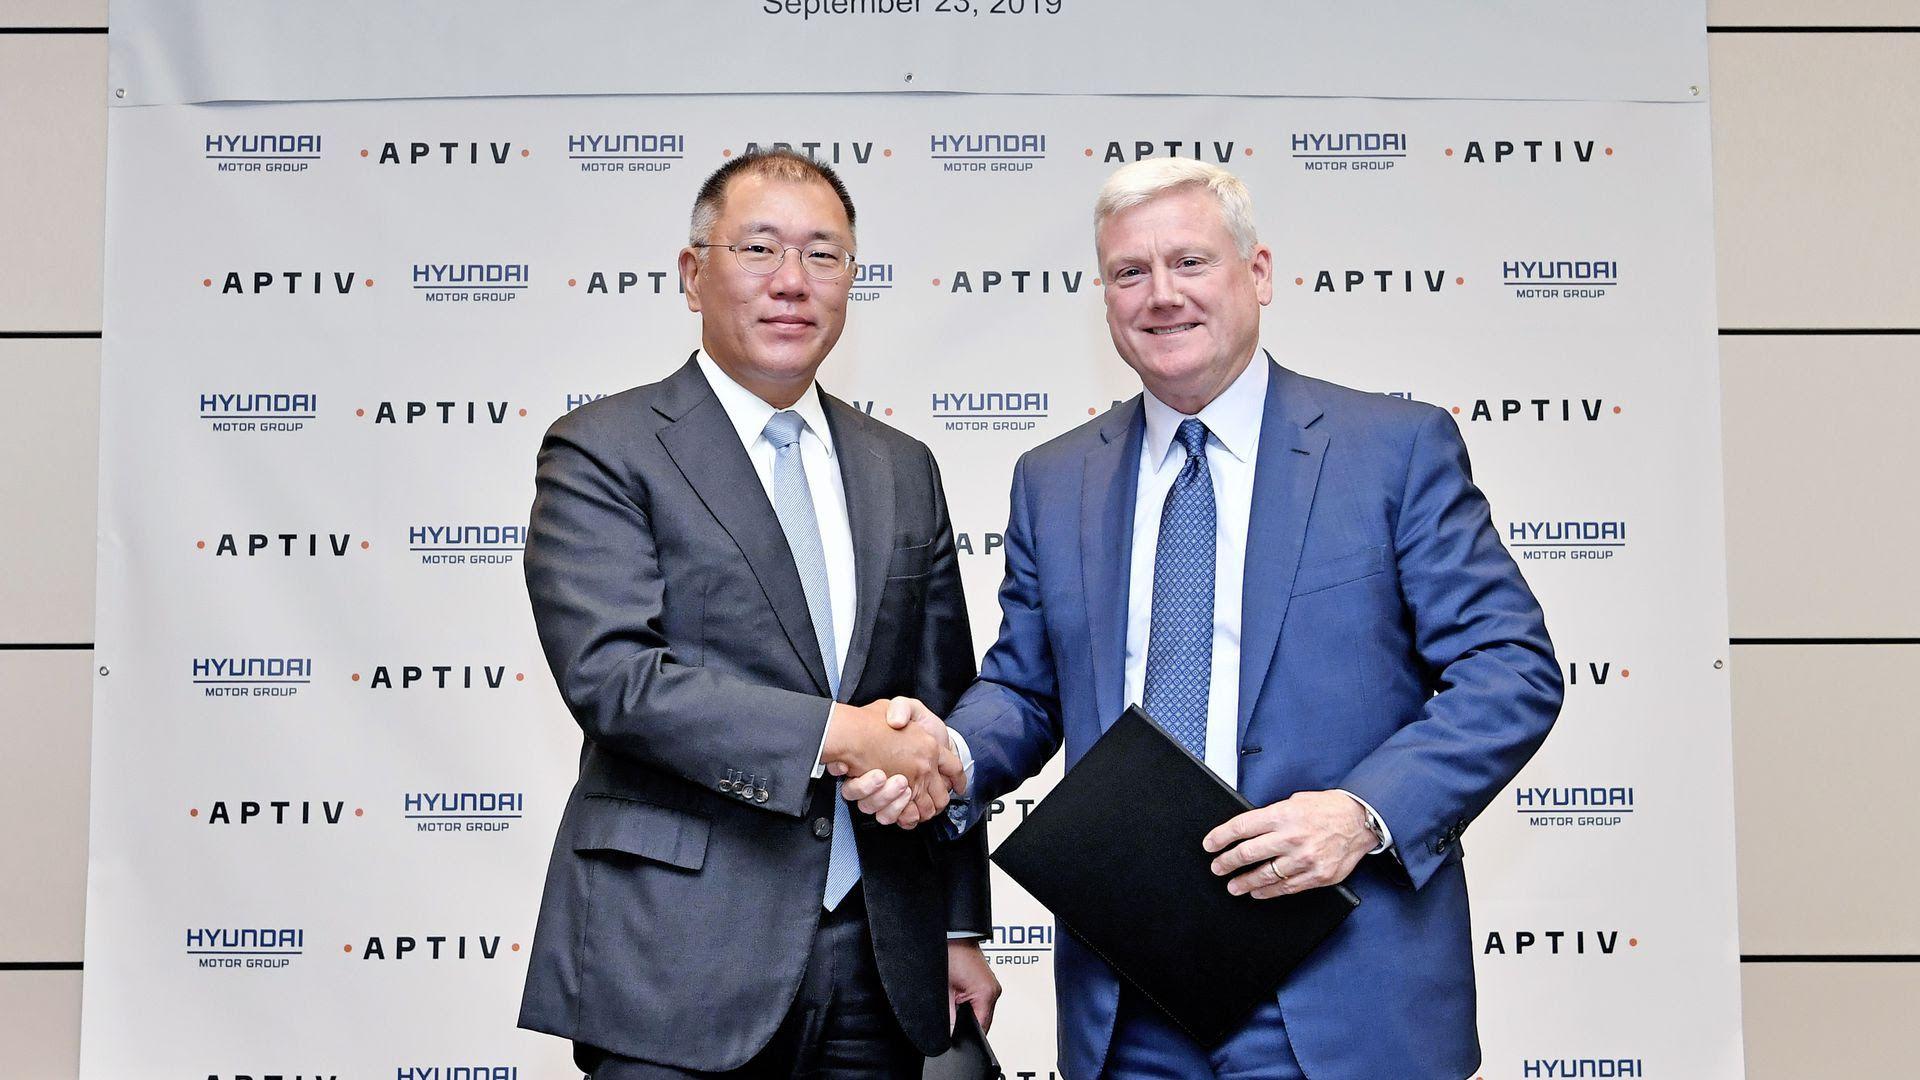 Euisun Chung, executive vice chairman of Hyundai Motor Group and Kevin Clark, president and CEO of Aptiv.